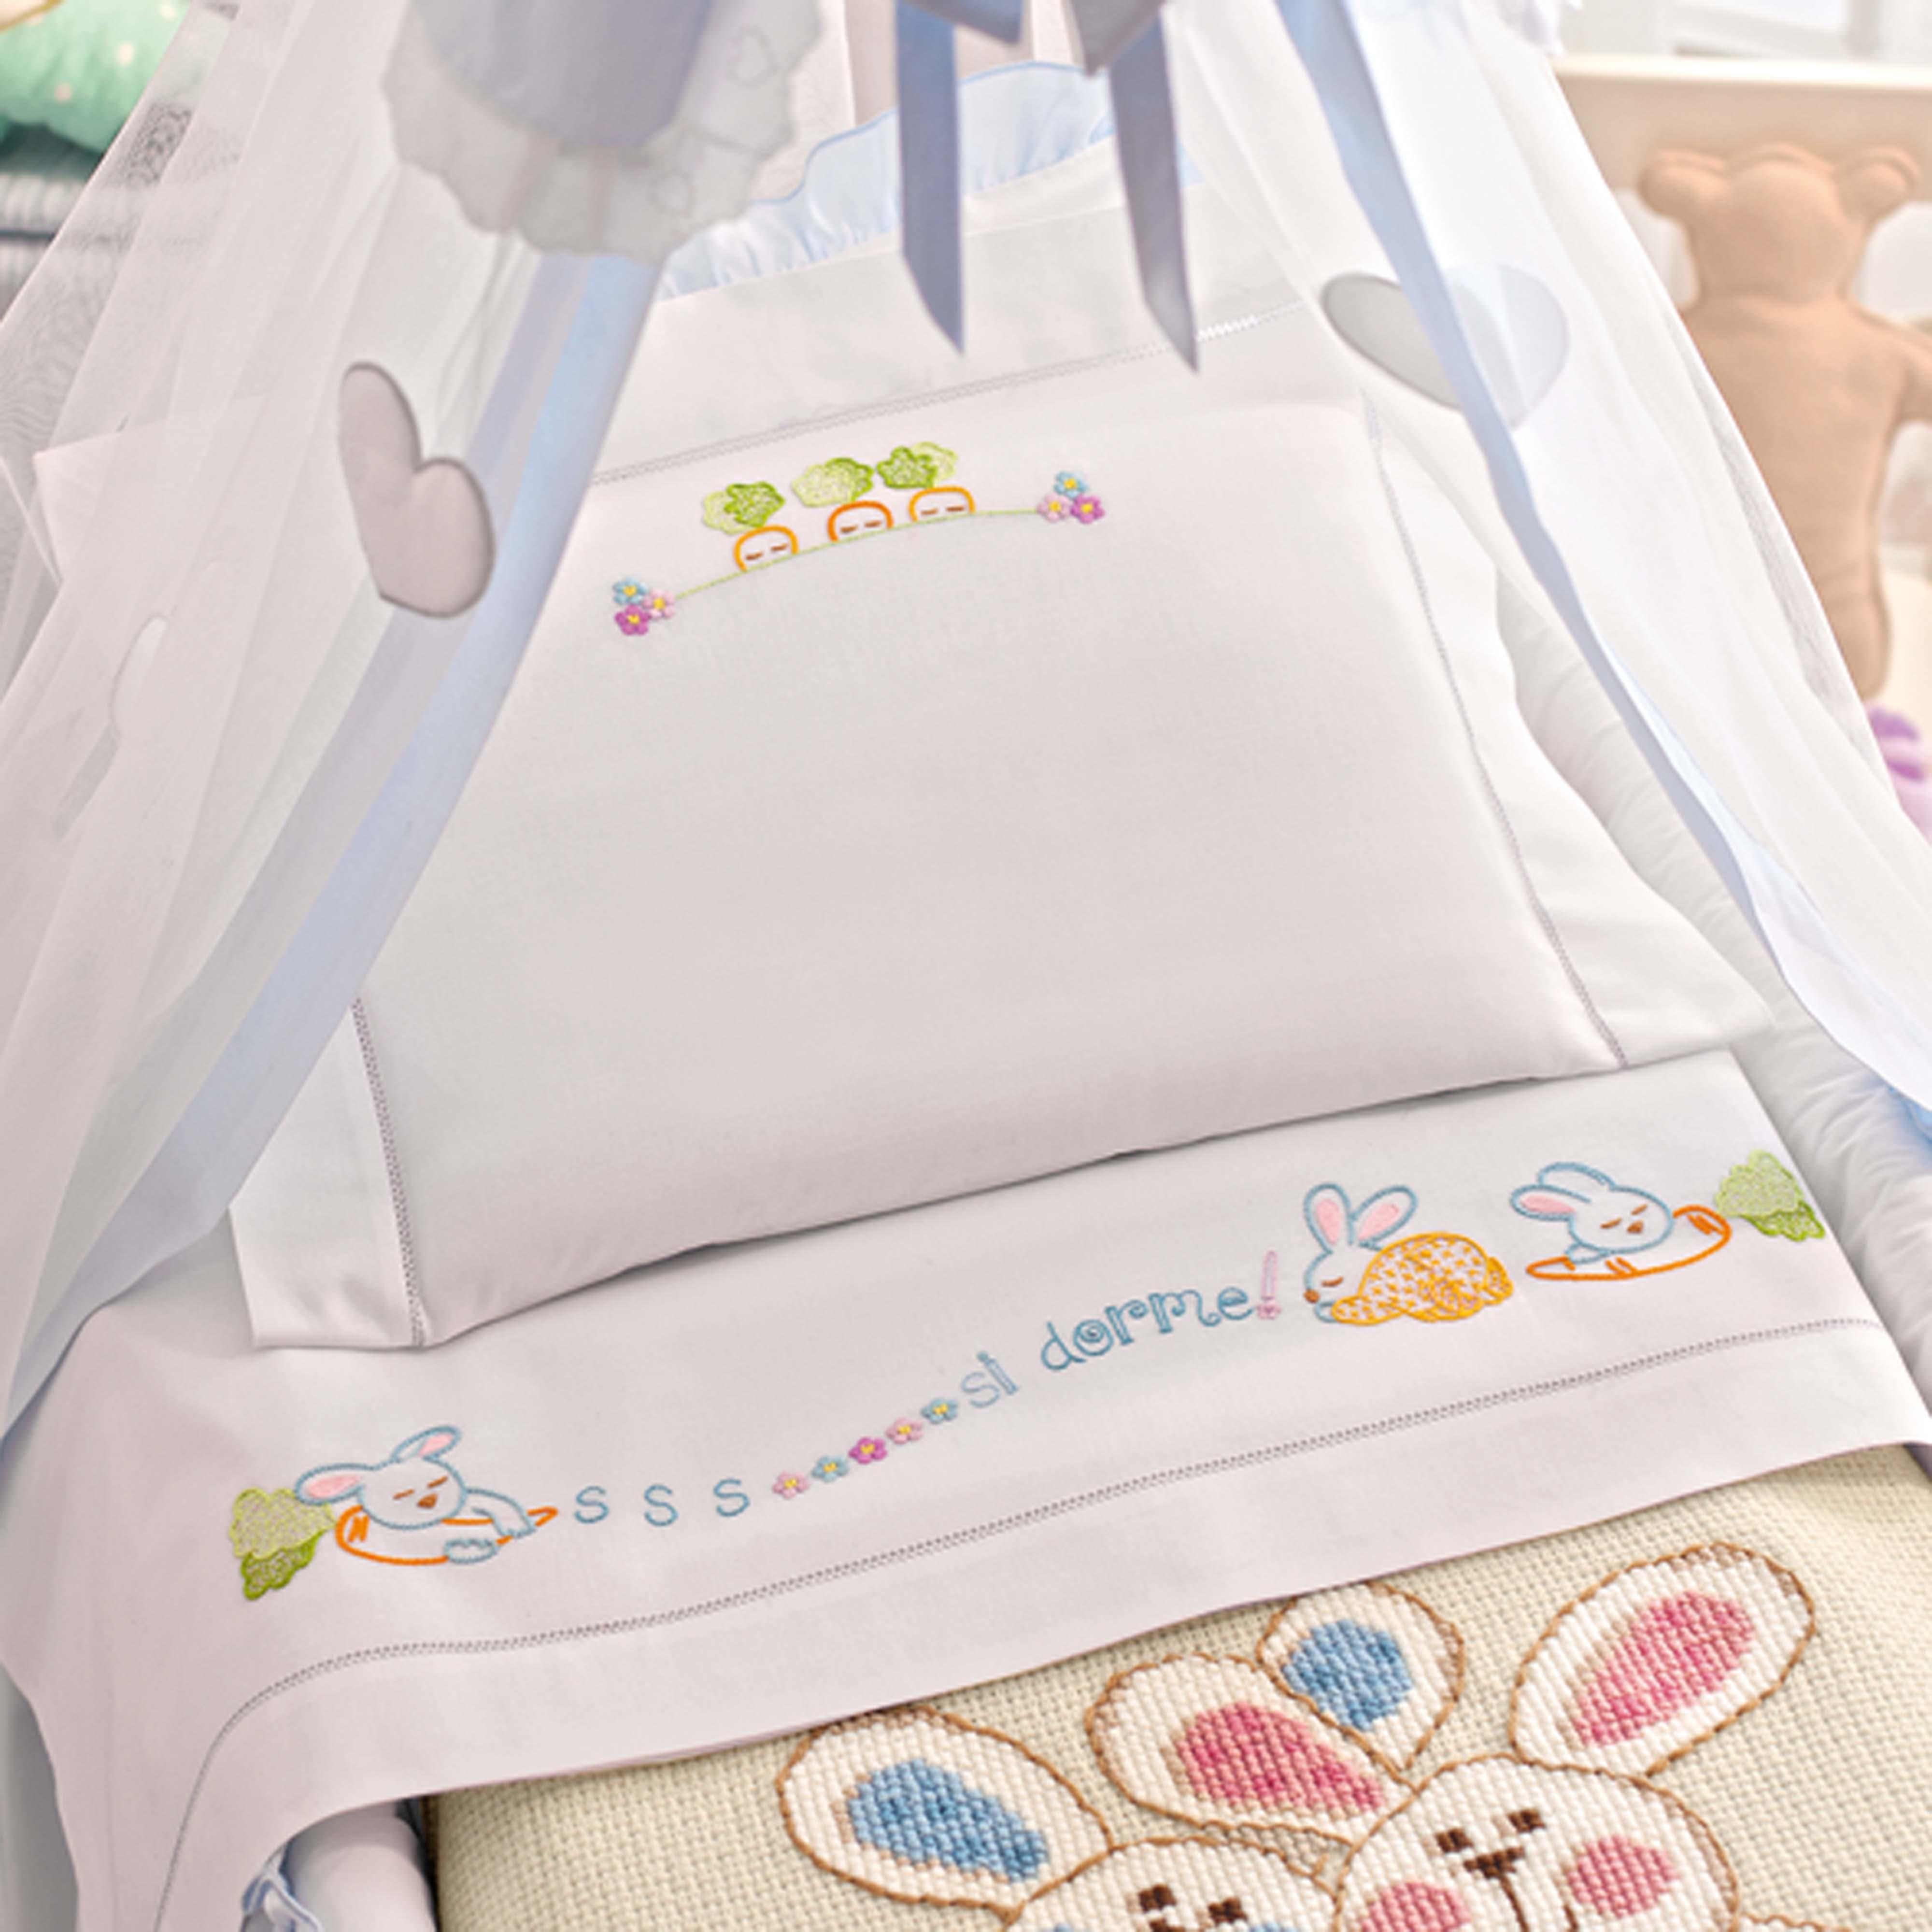 Disegno carta per lenzuolino culla, punti vari